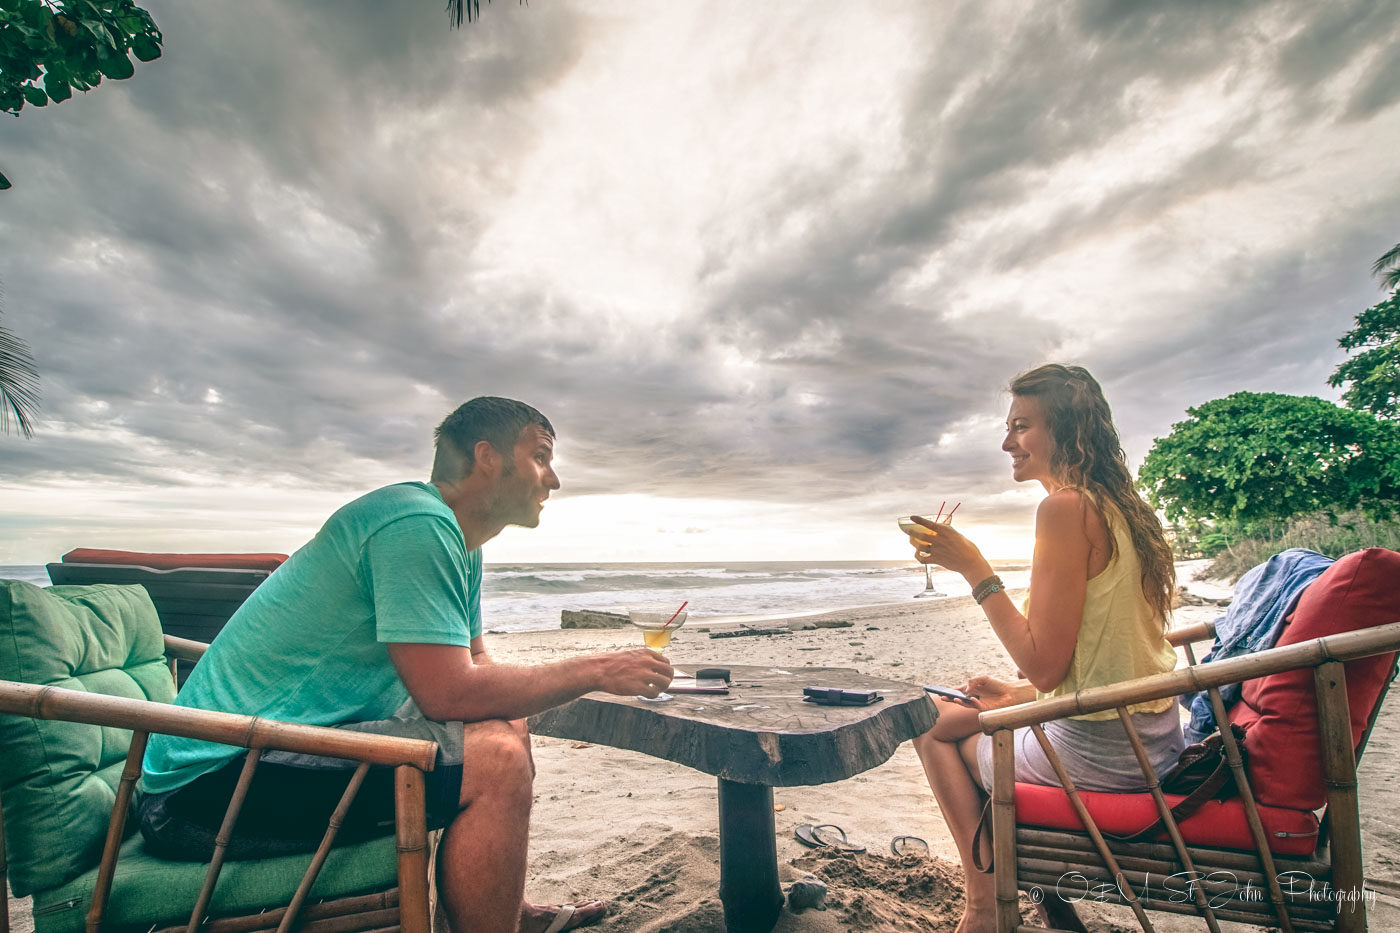 Oksana & Max sunset drinks at Habanero in Santa Teresa. Costa Rica